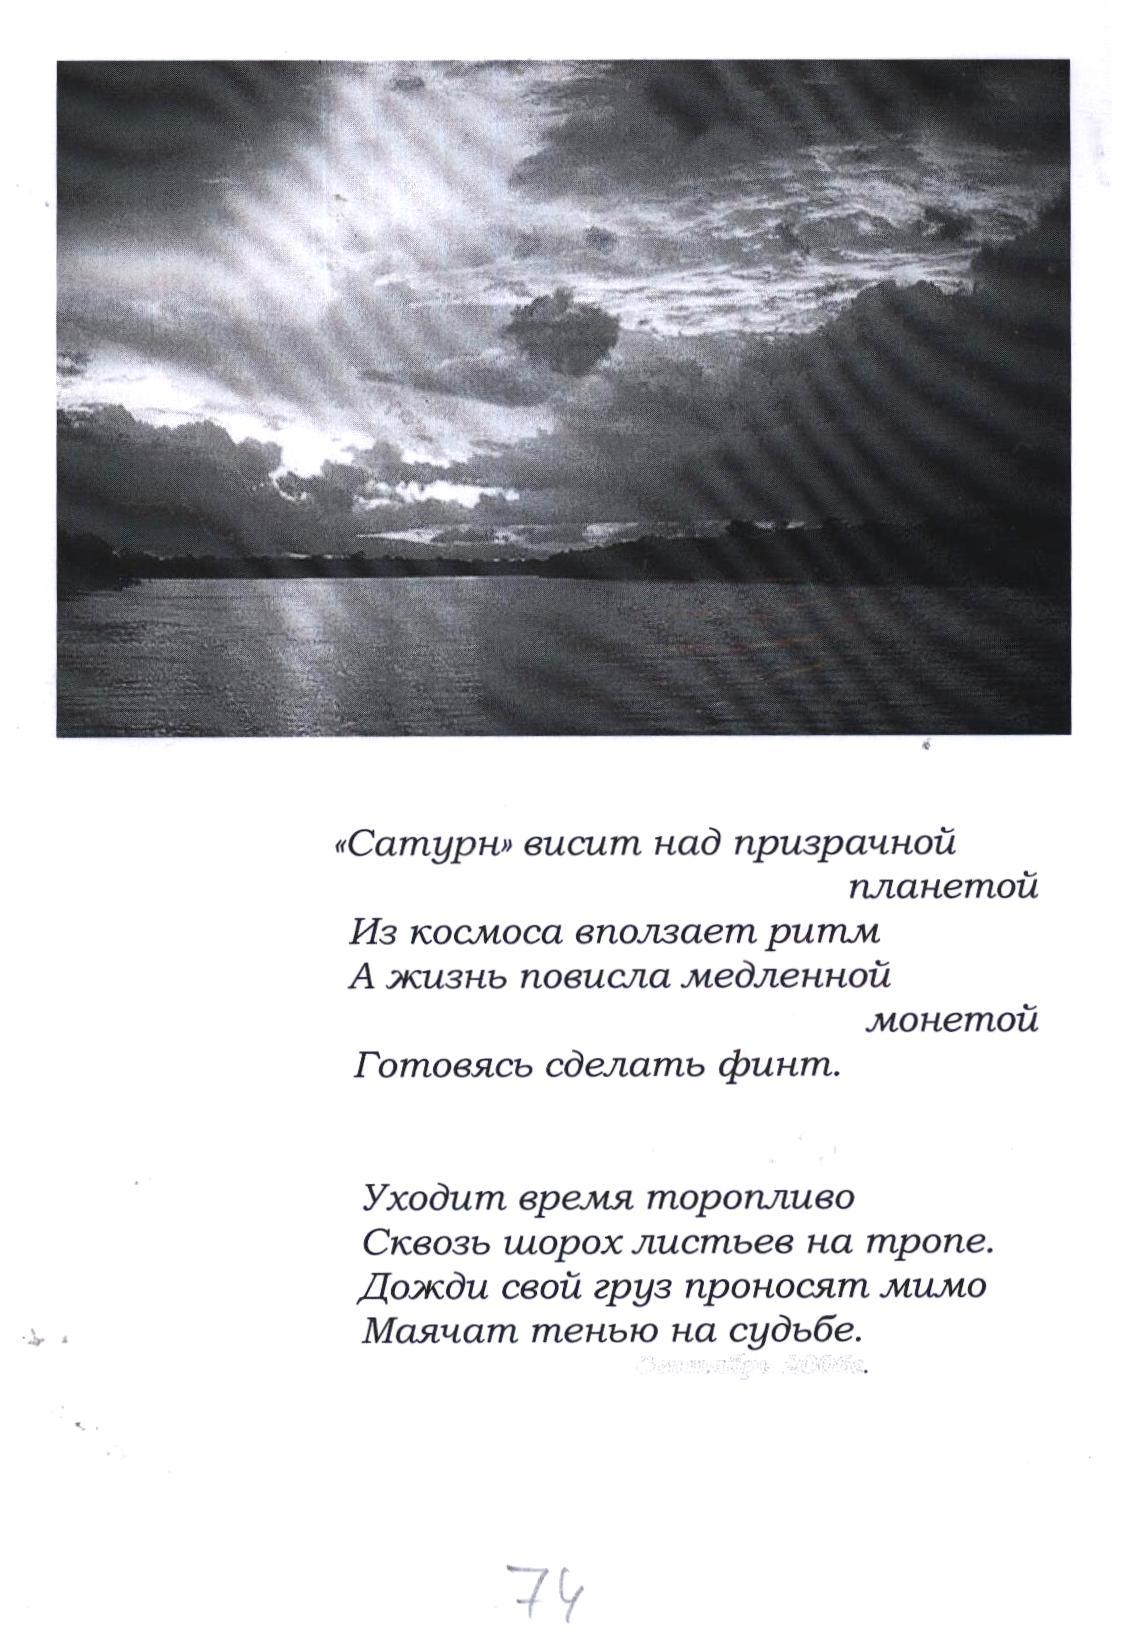 Стихи 073.jpg